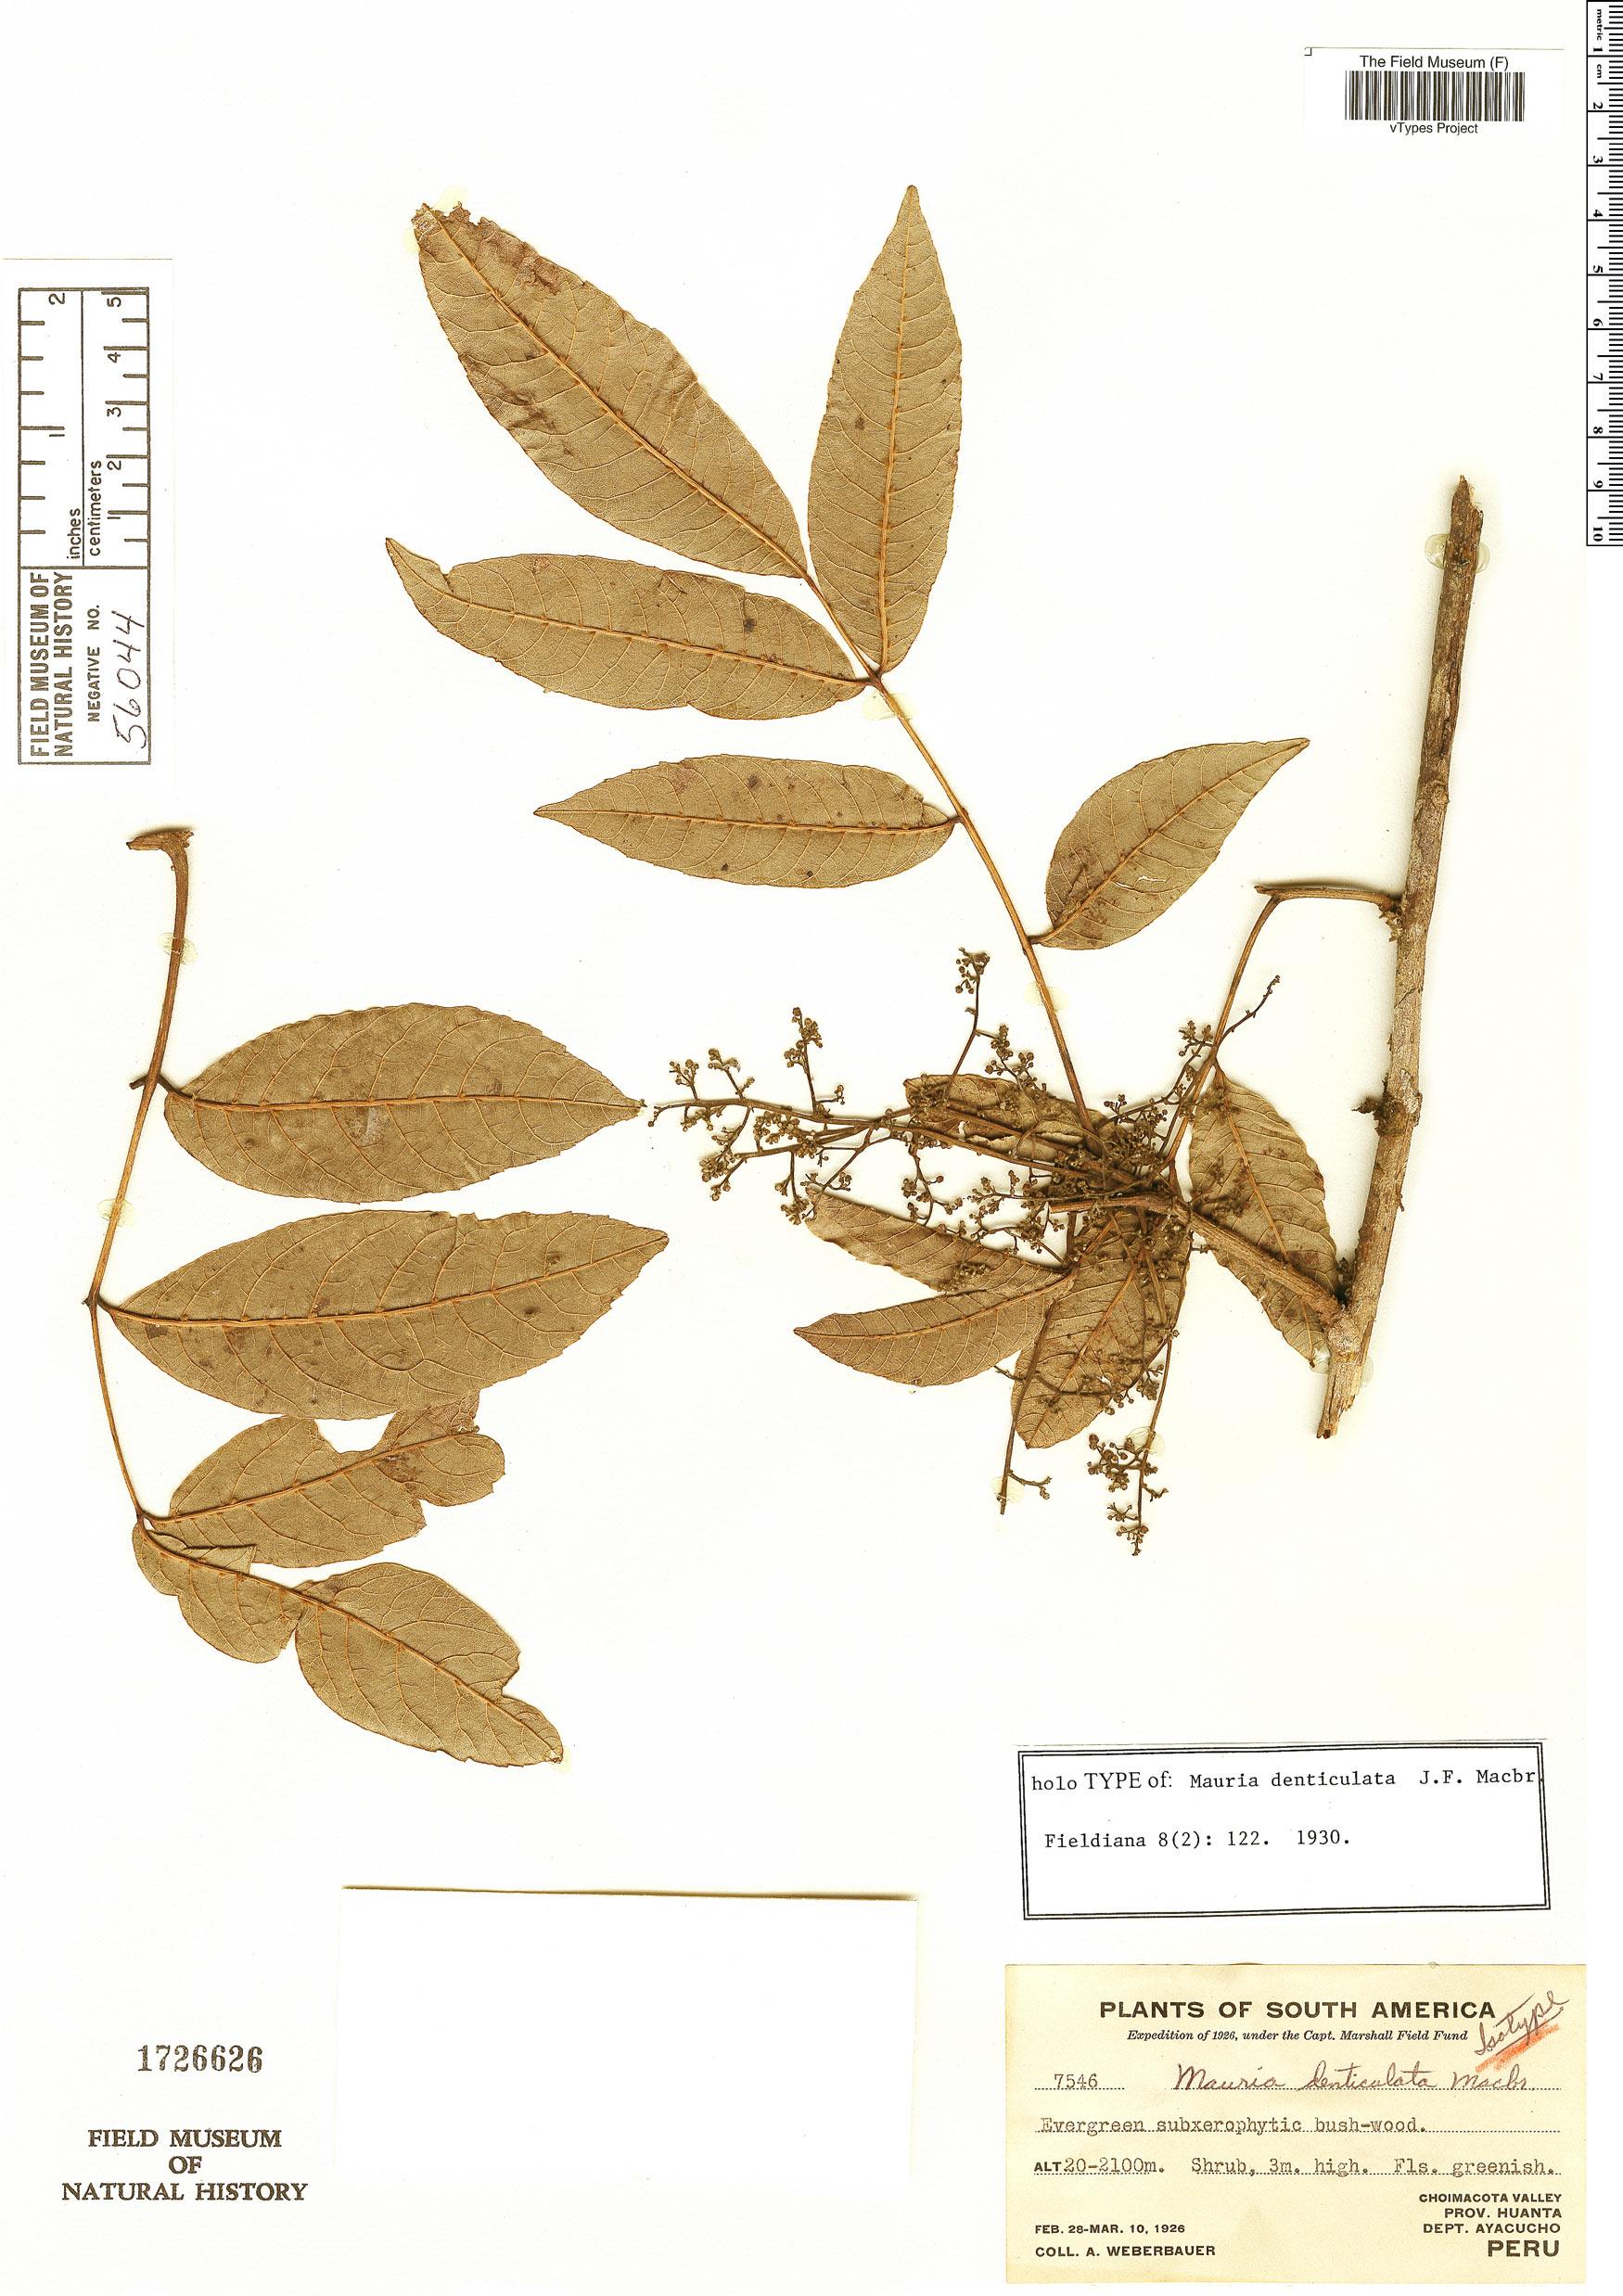 Espécimen: Mauria denticulata